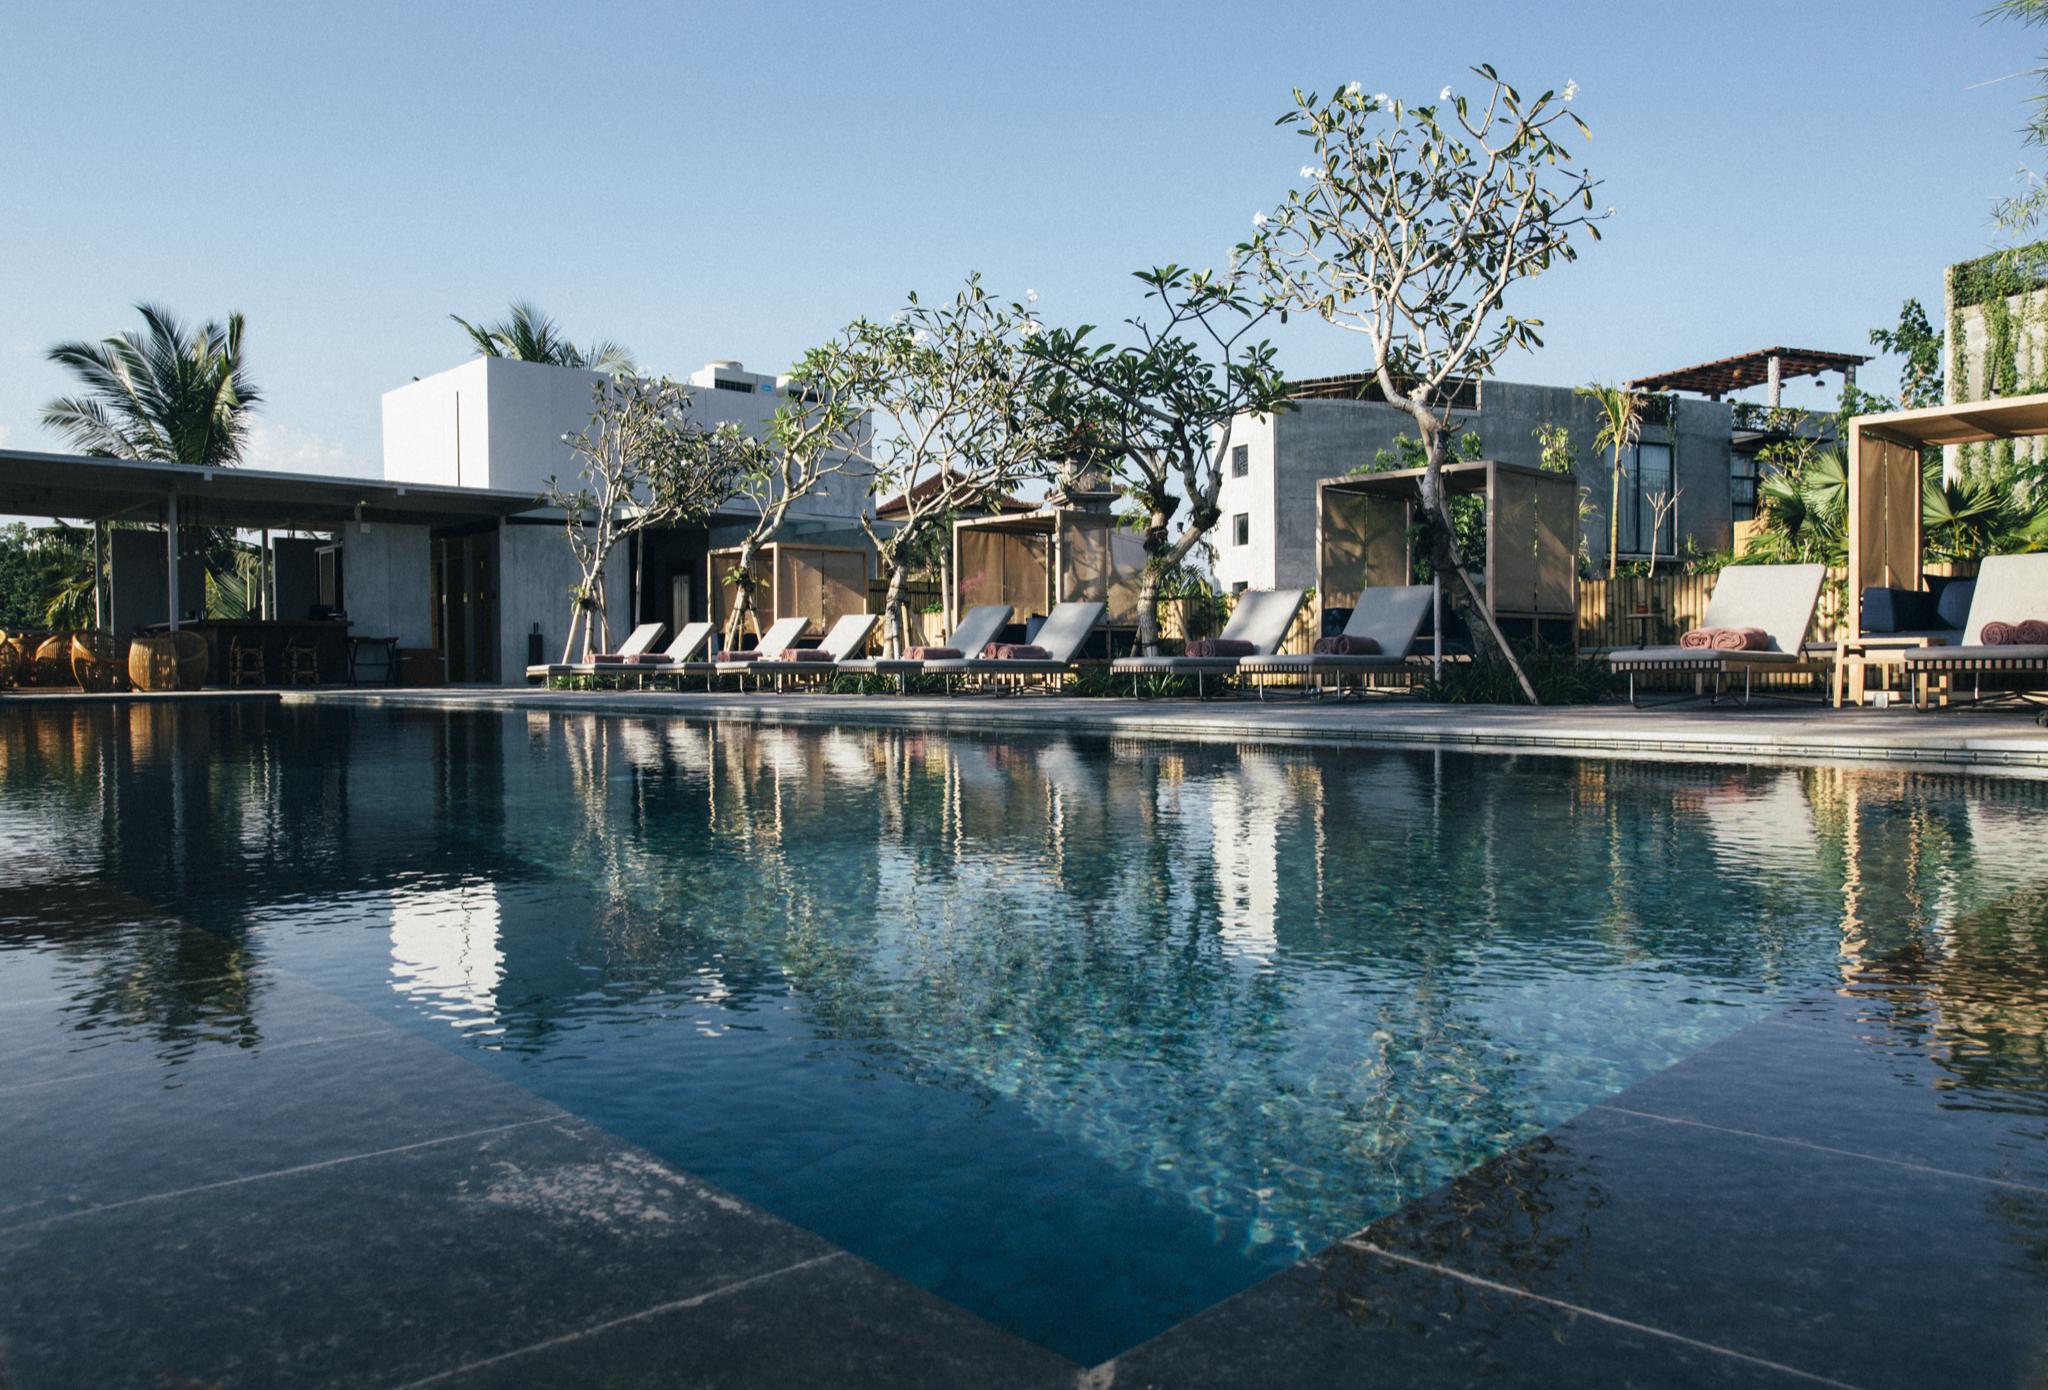 Bisma Eight, Ubud: A Modern Tropical Experience – The Luxury Bali